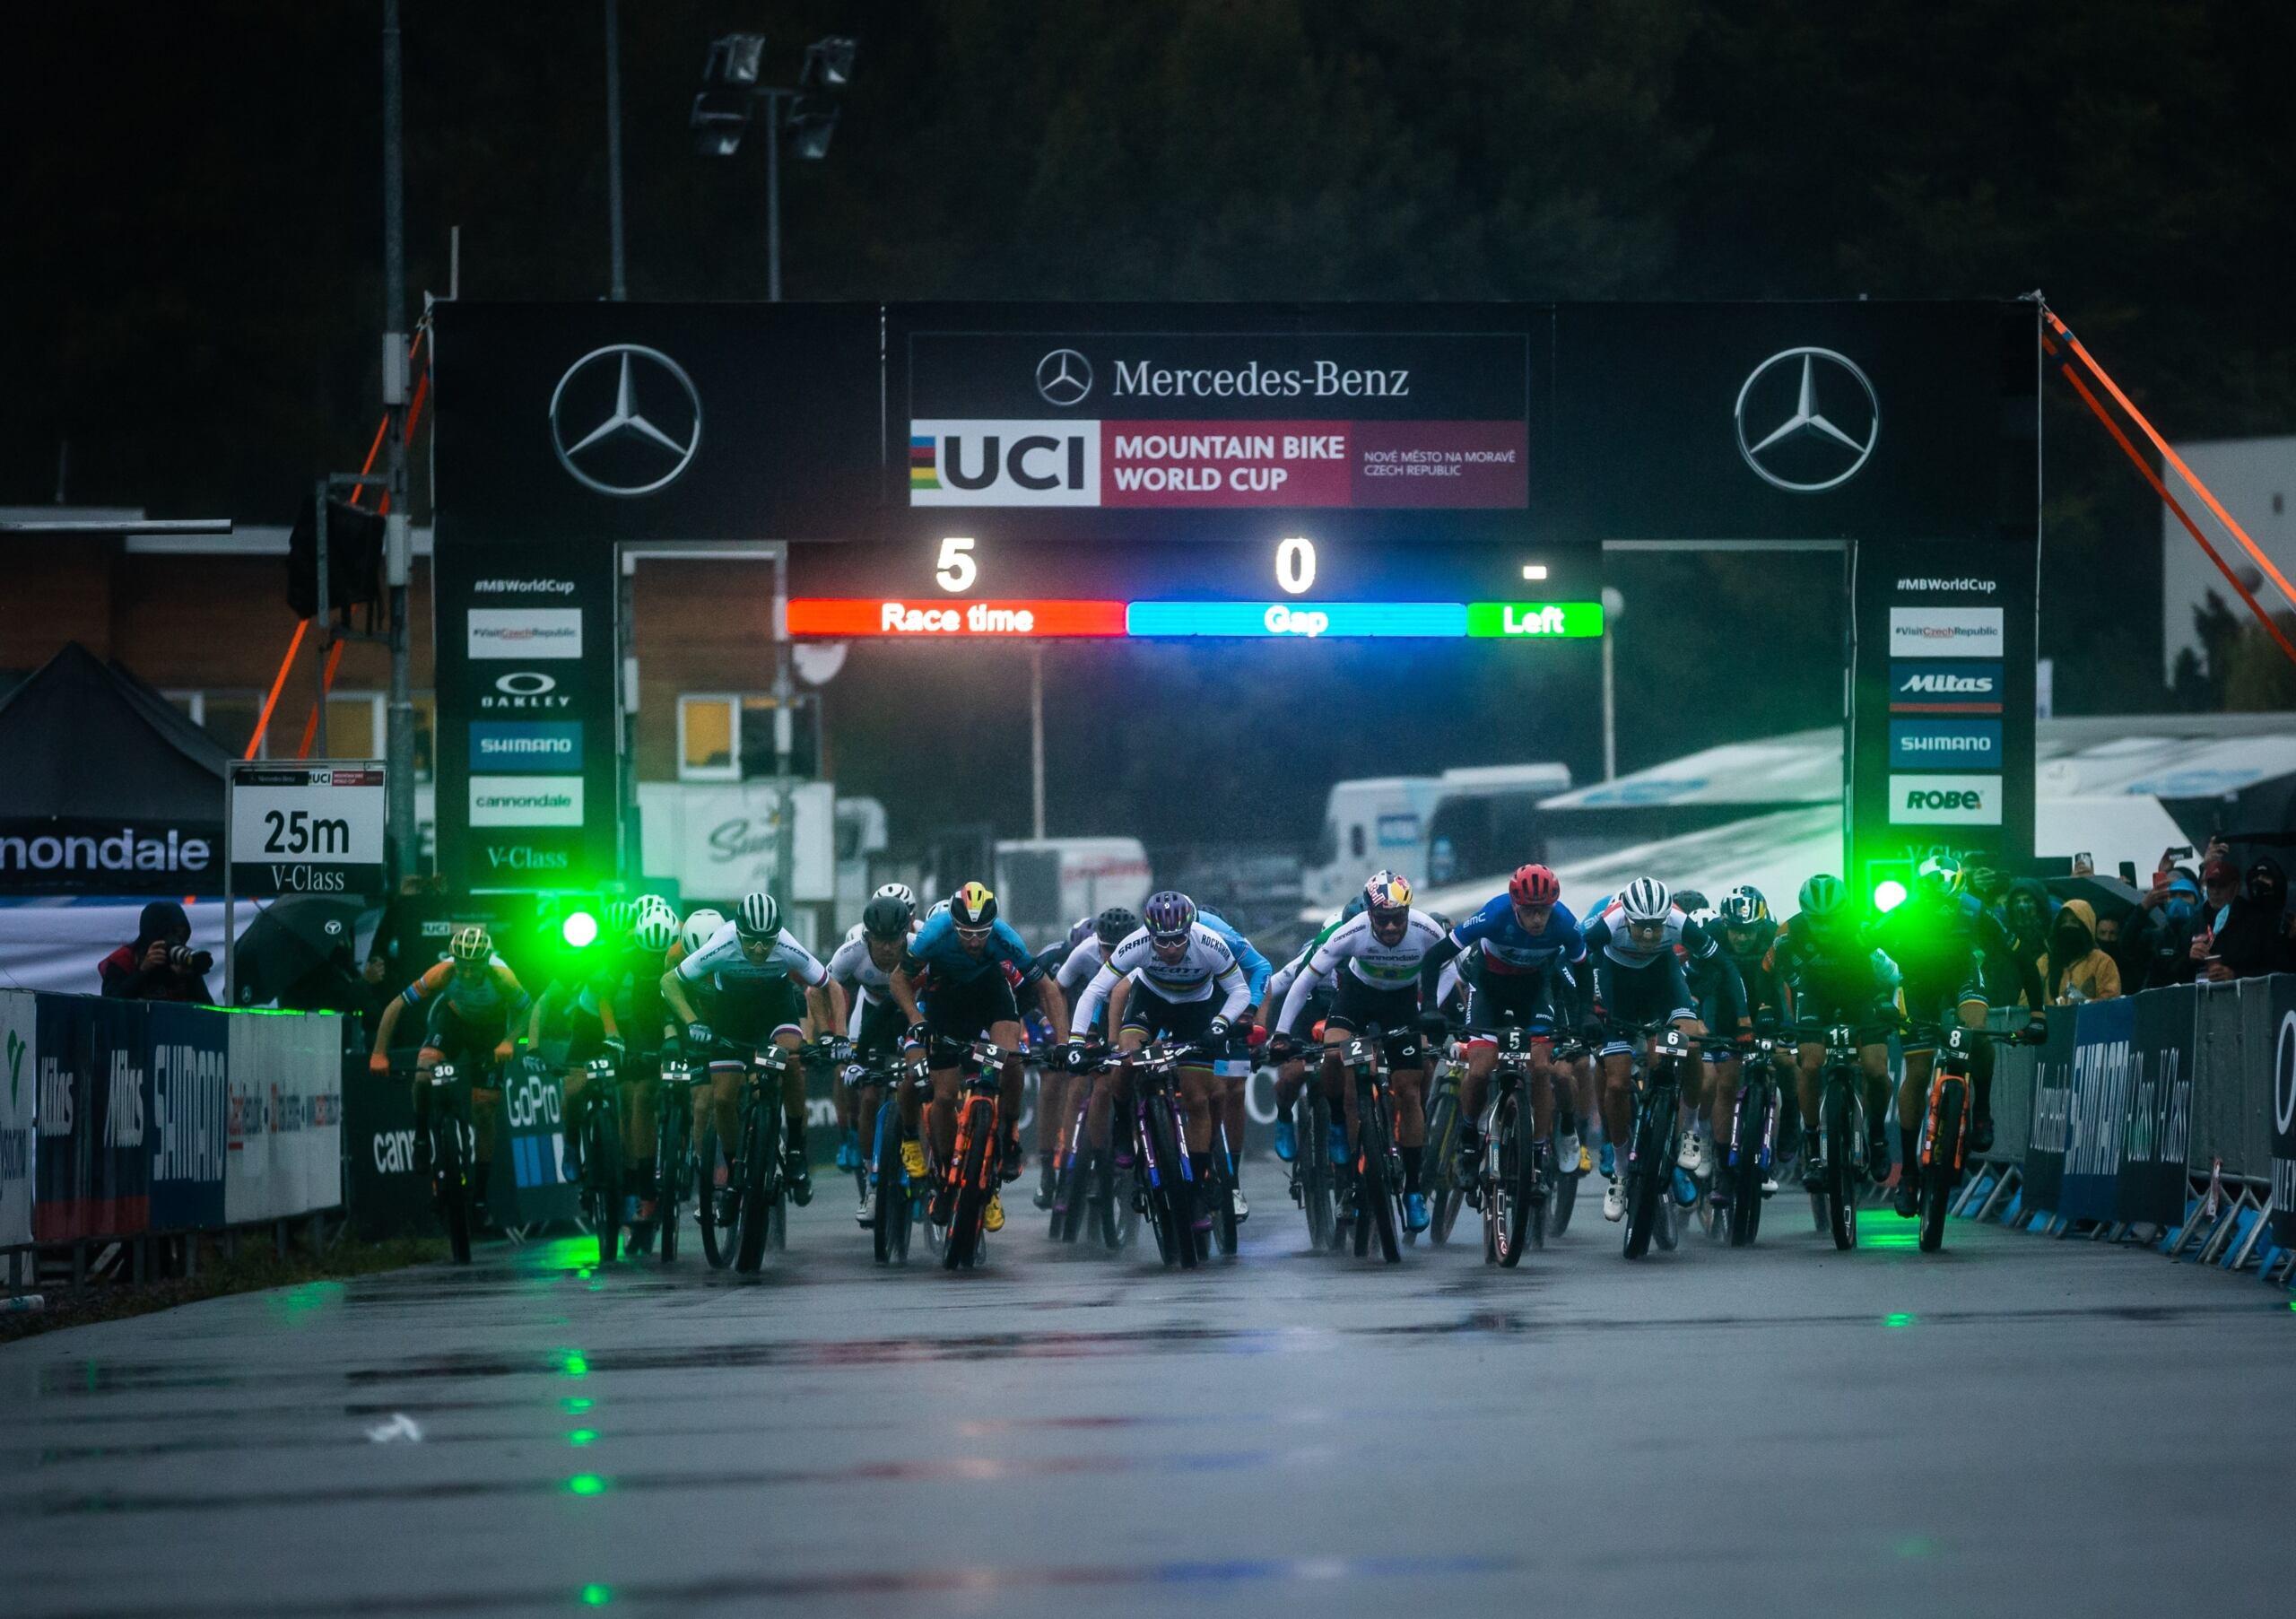 Mercedes Union Cycliste Internationale